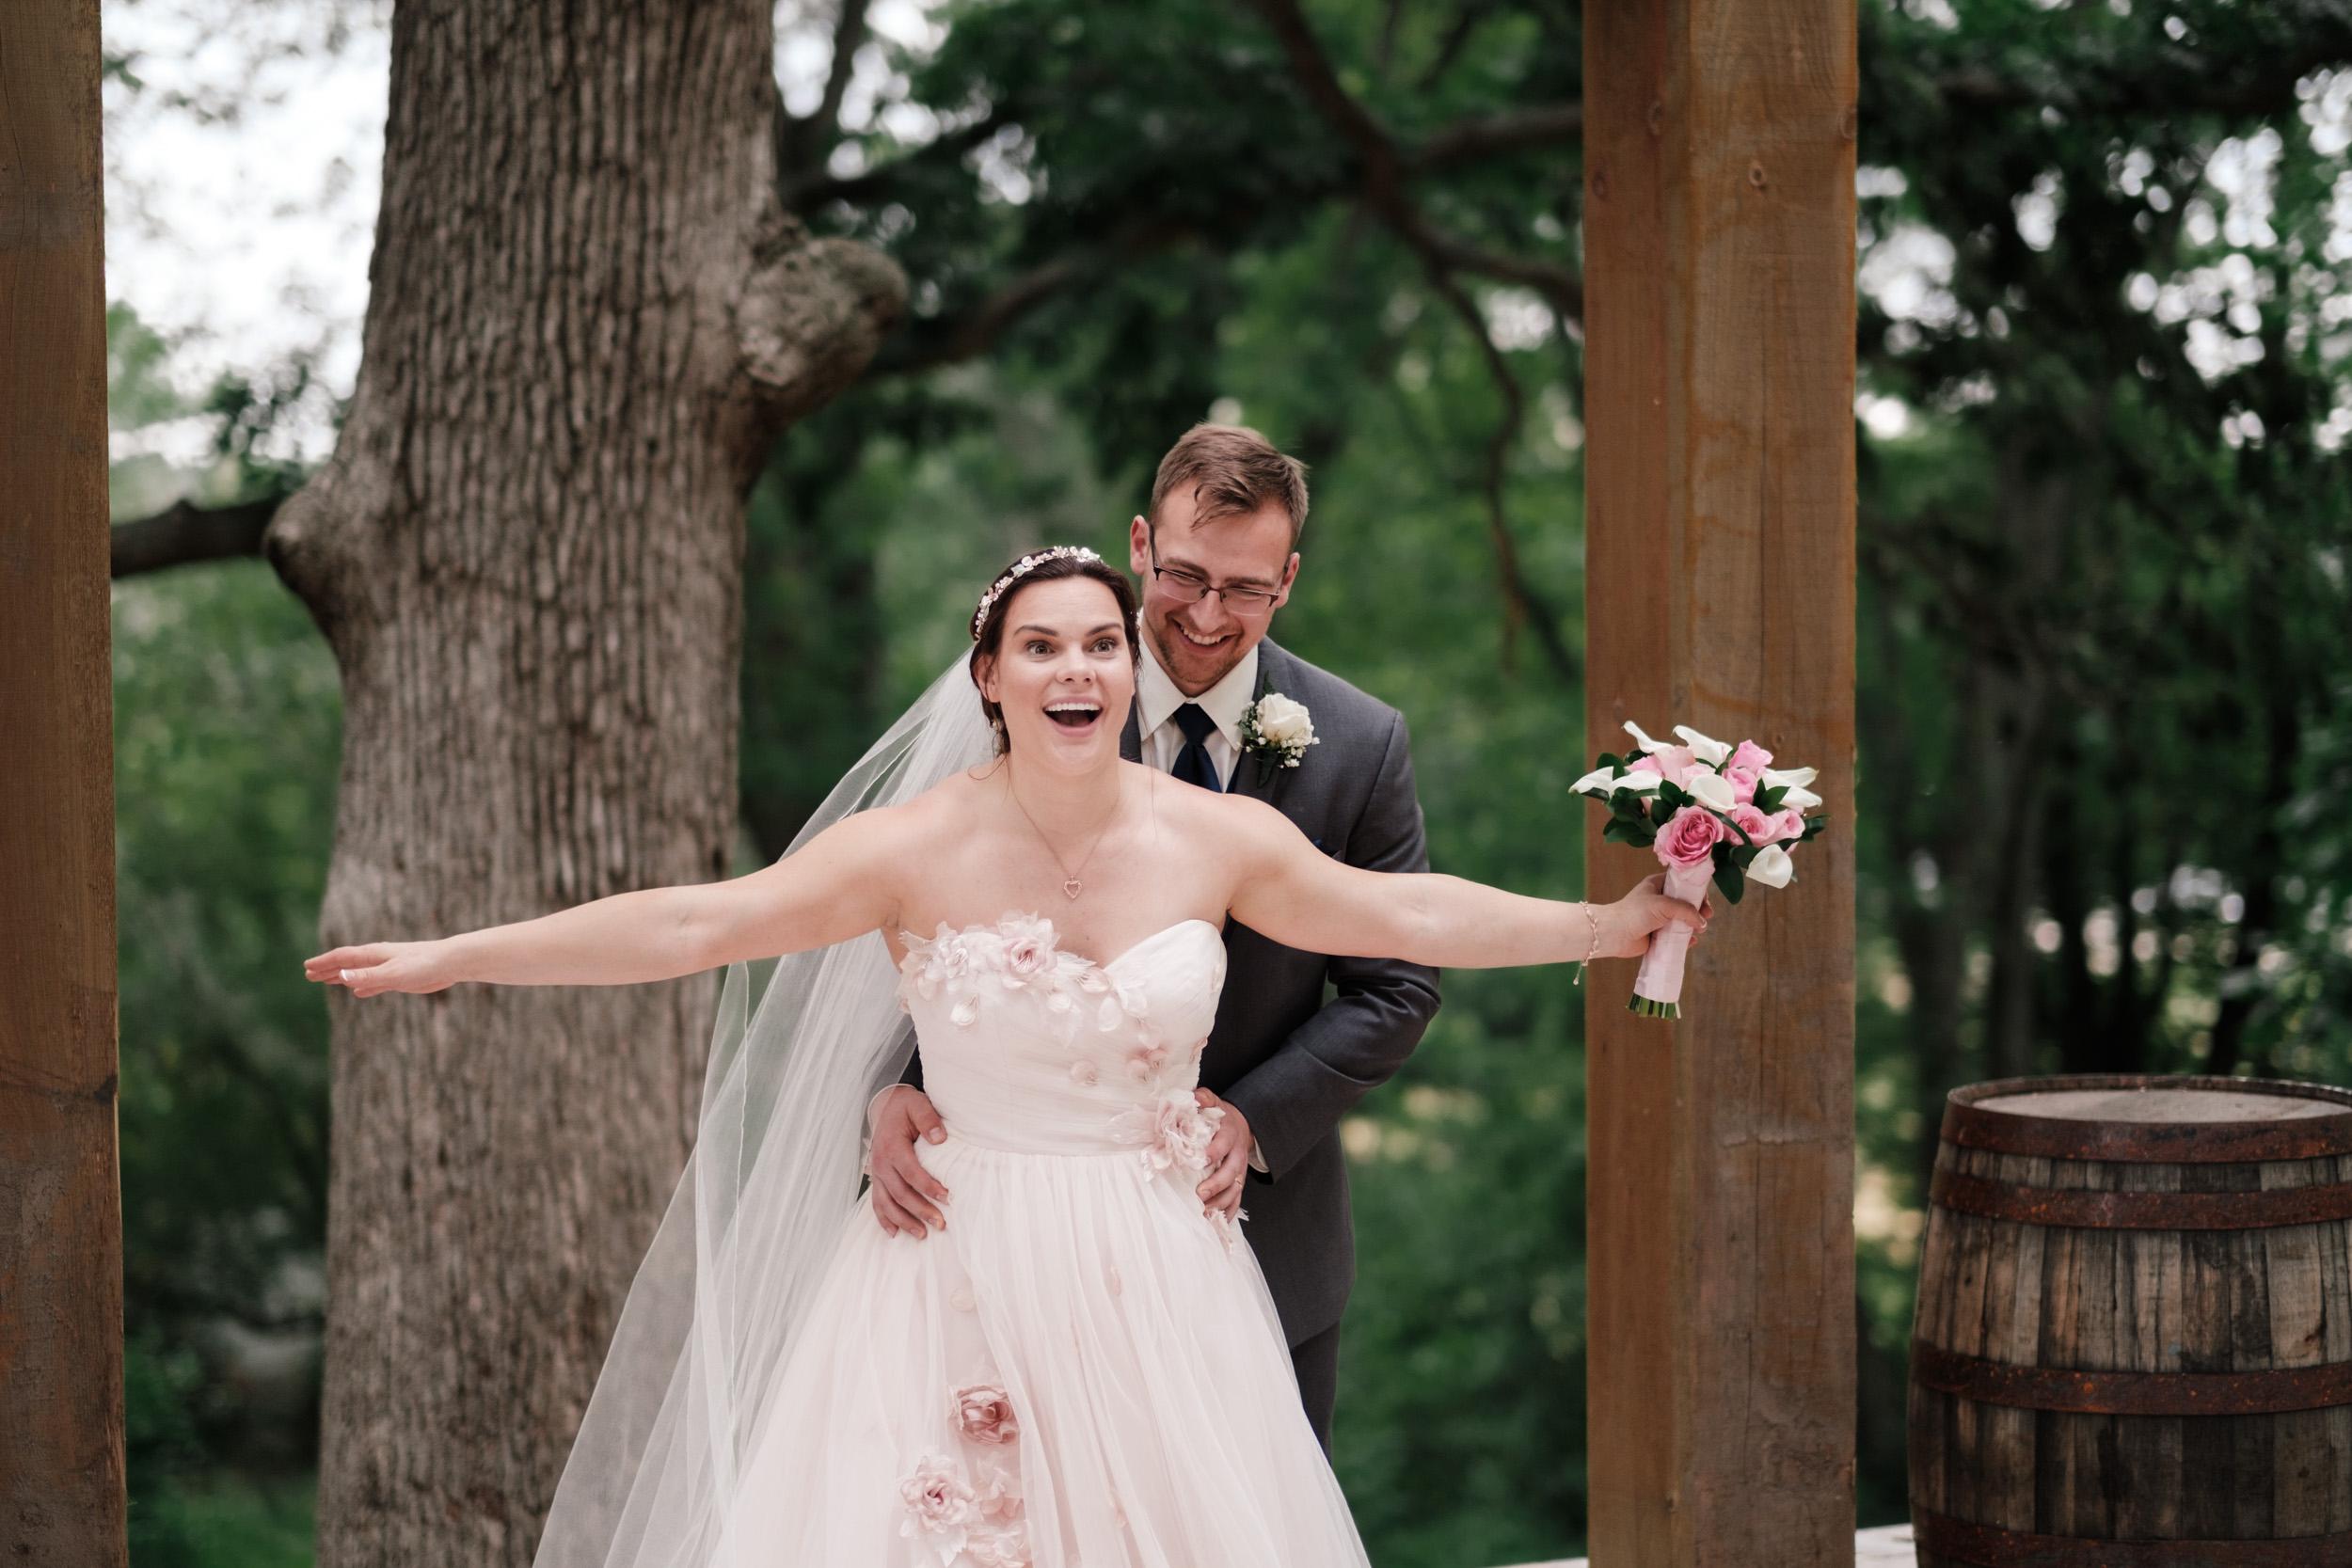 19-06-22-Ryan-Katie-The-Fields-Reserve-Wedding-44.jpg